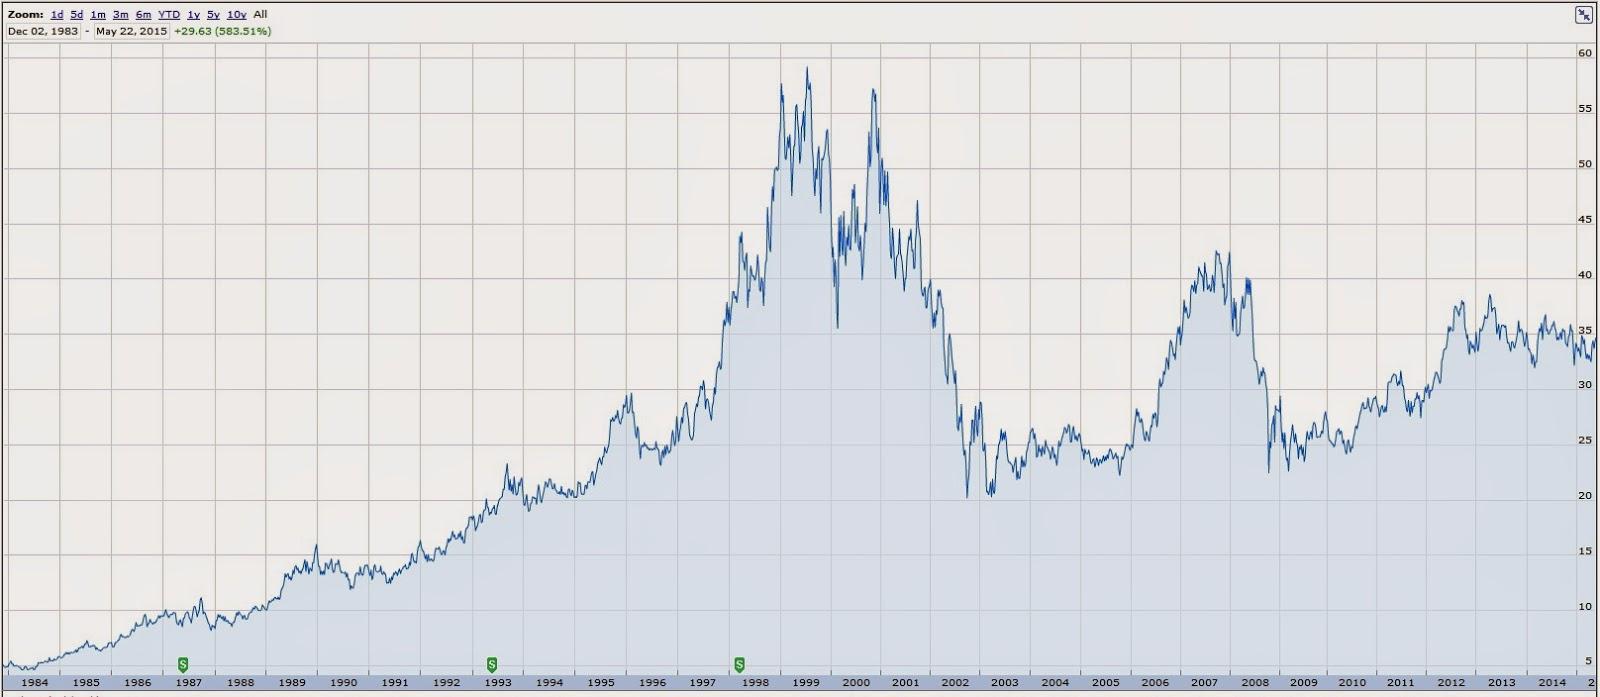 Captain dividend 2015 att stock chart biocorpaavc Gallery